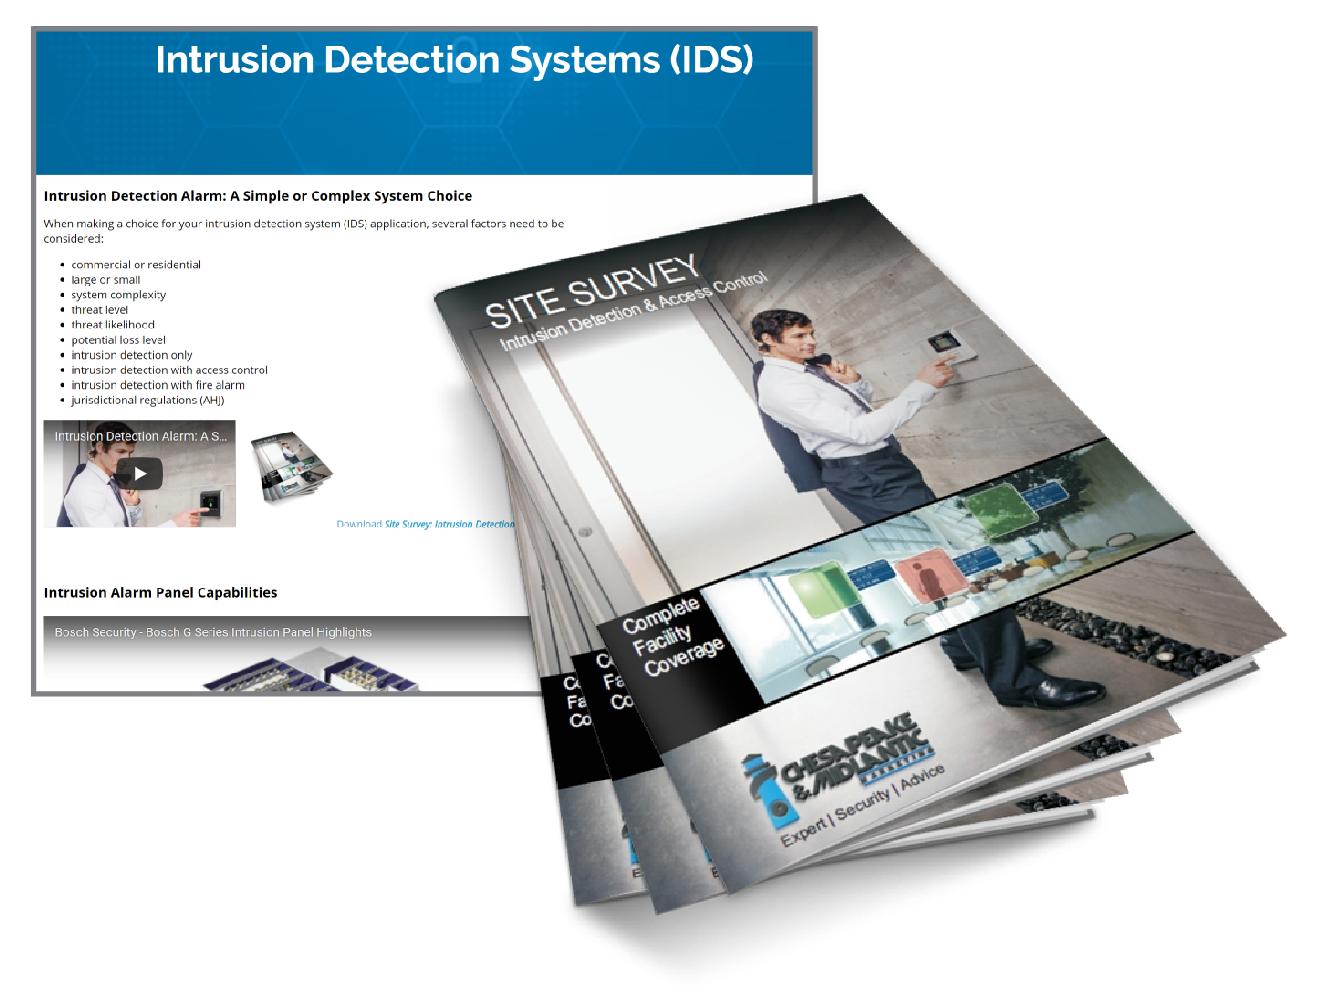 Intrusion Portal with Site Survey Image.png